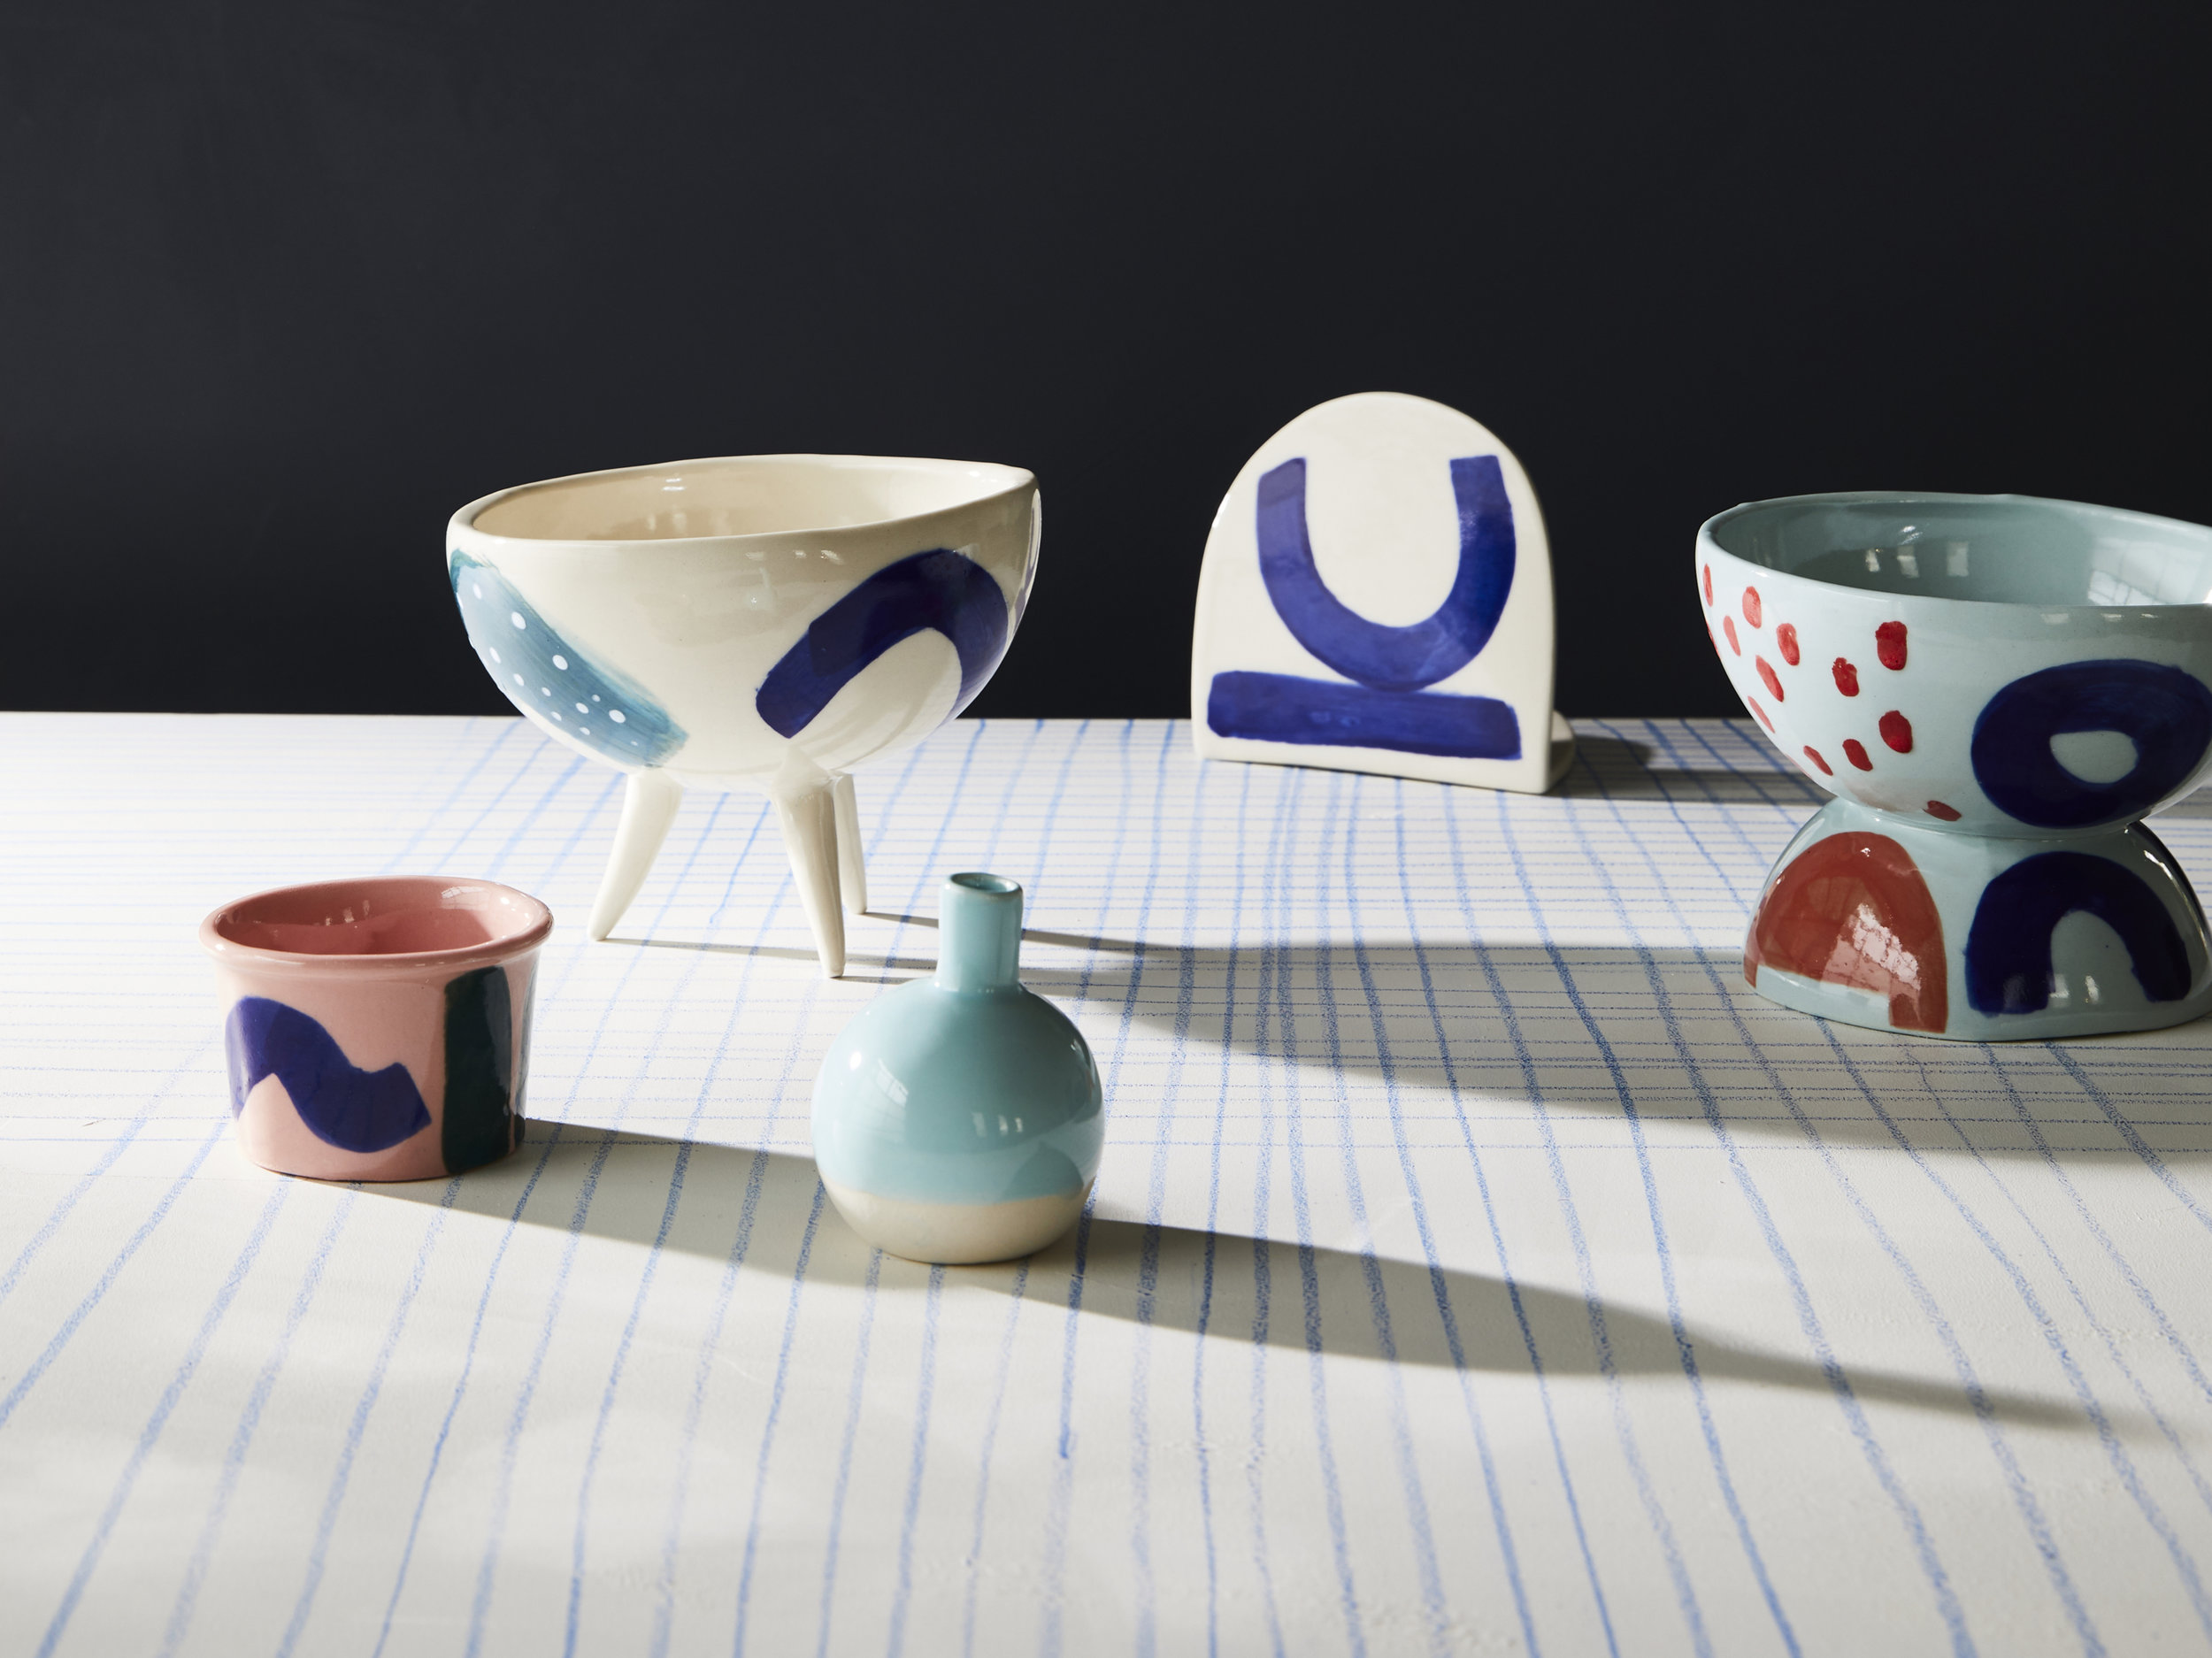 Kaz-morton-various-bowls.jpg